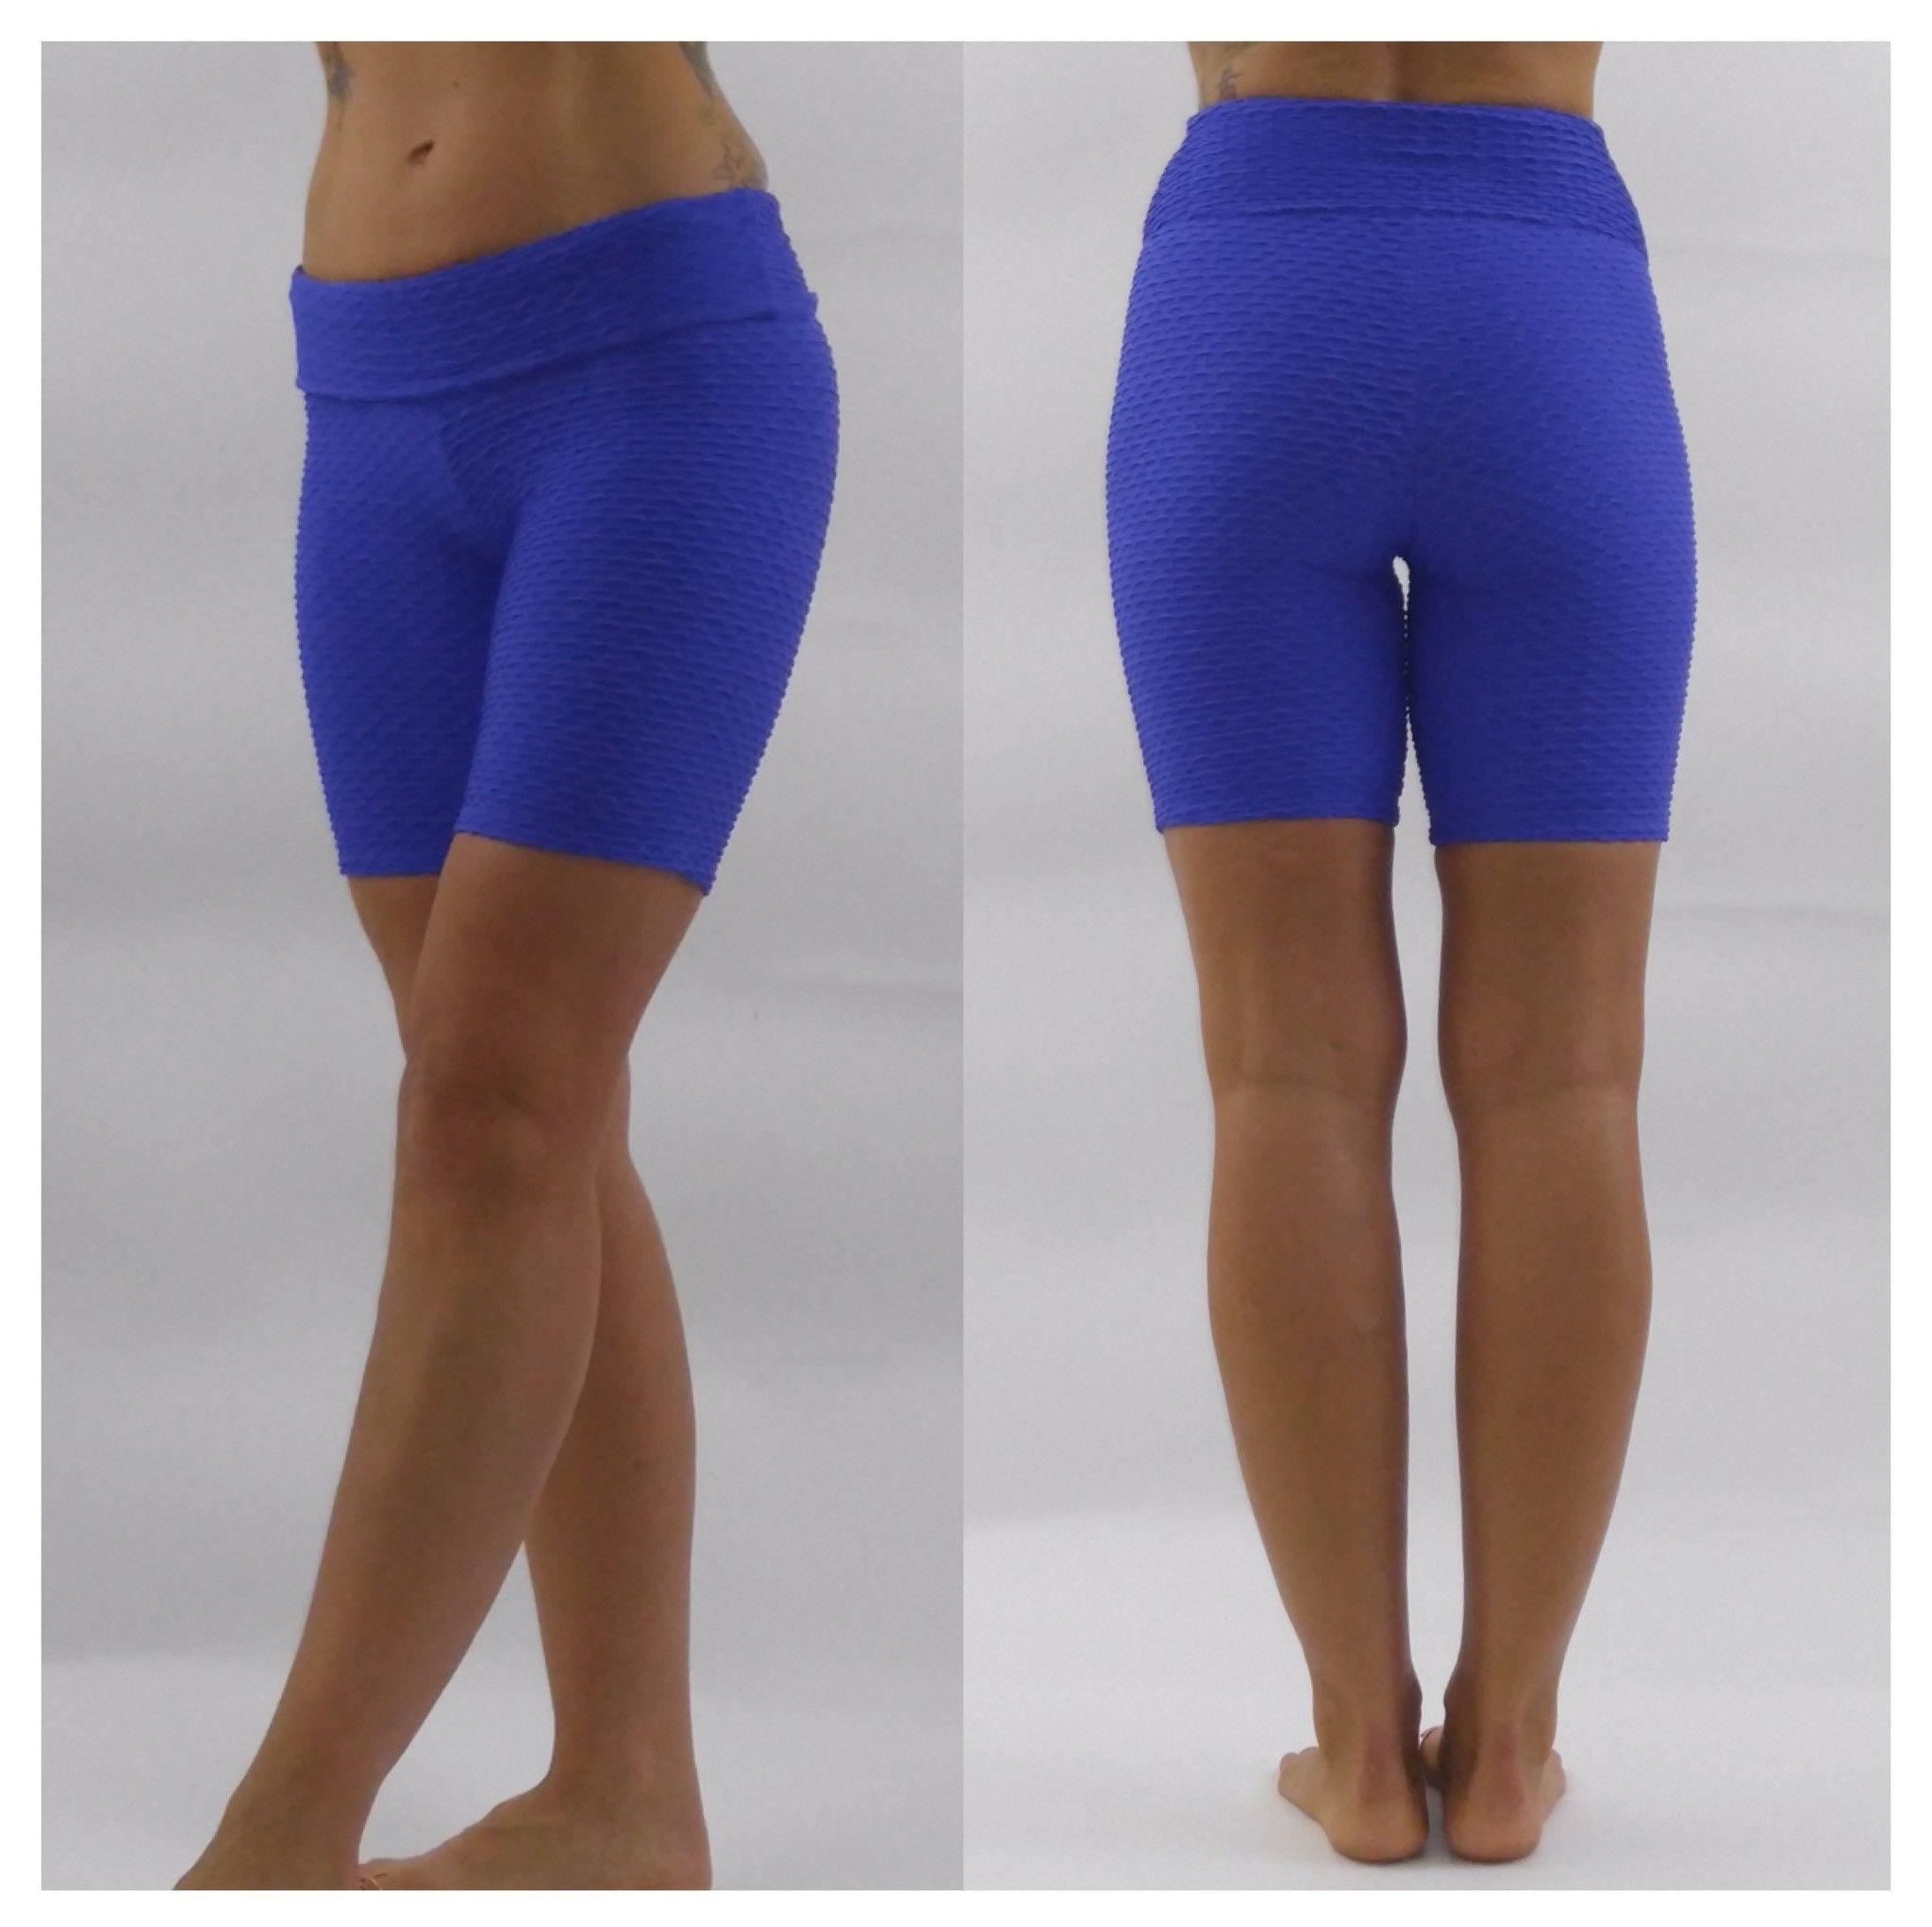 Blue Scallops - Textured Shorts